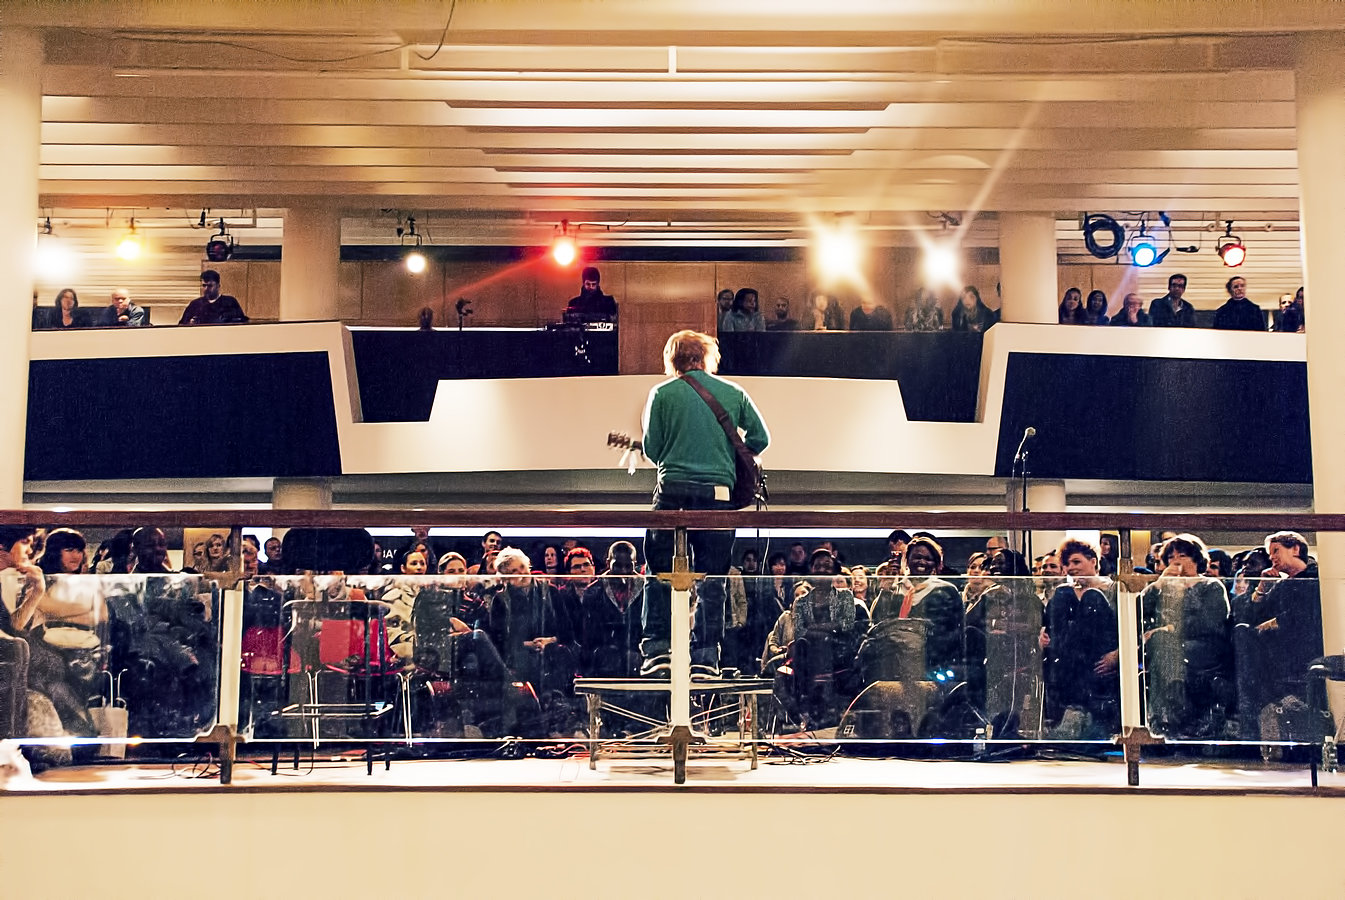 Ed Sheeran, Southbank Center, London